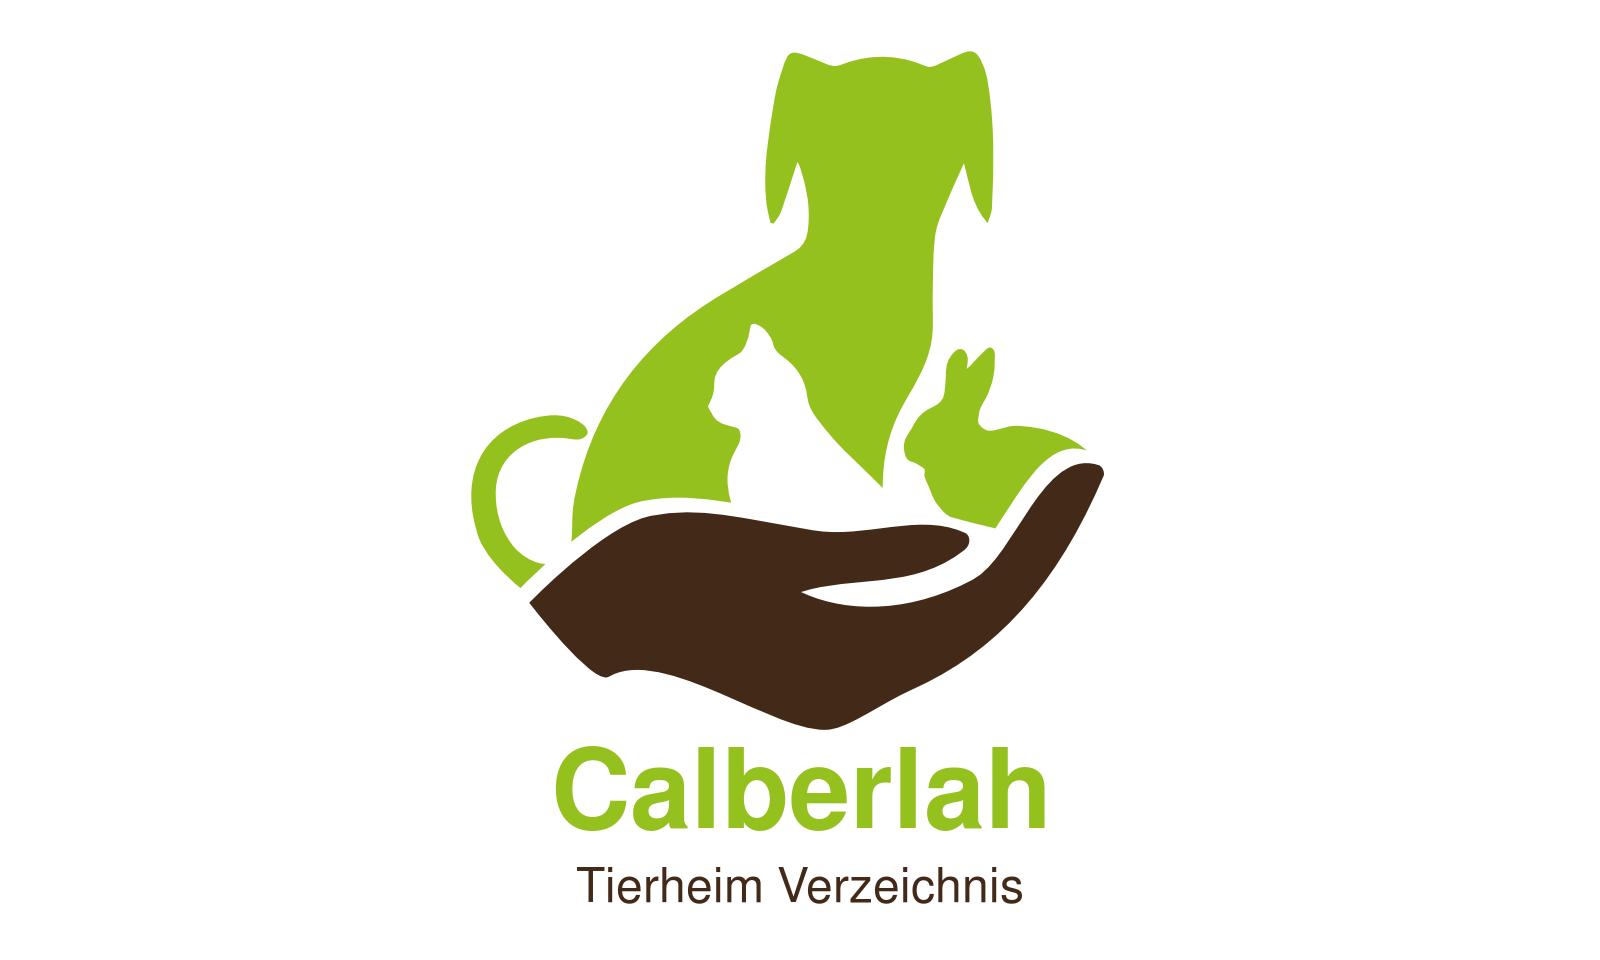 Tierheim Calberlah